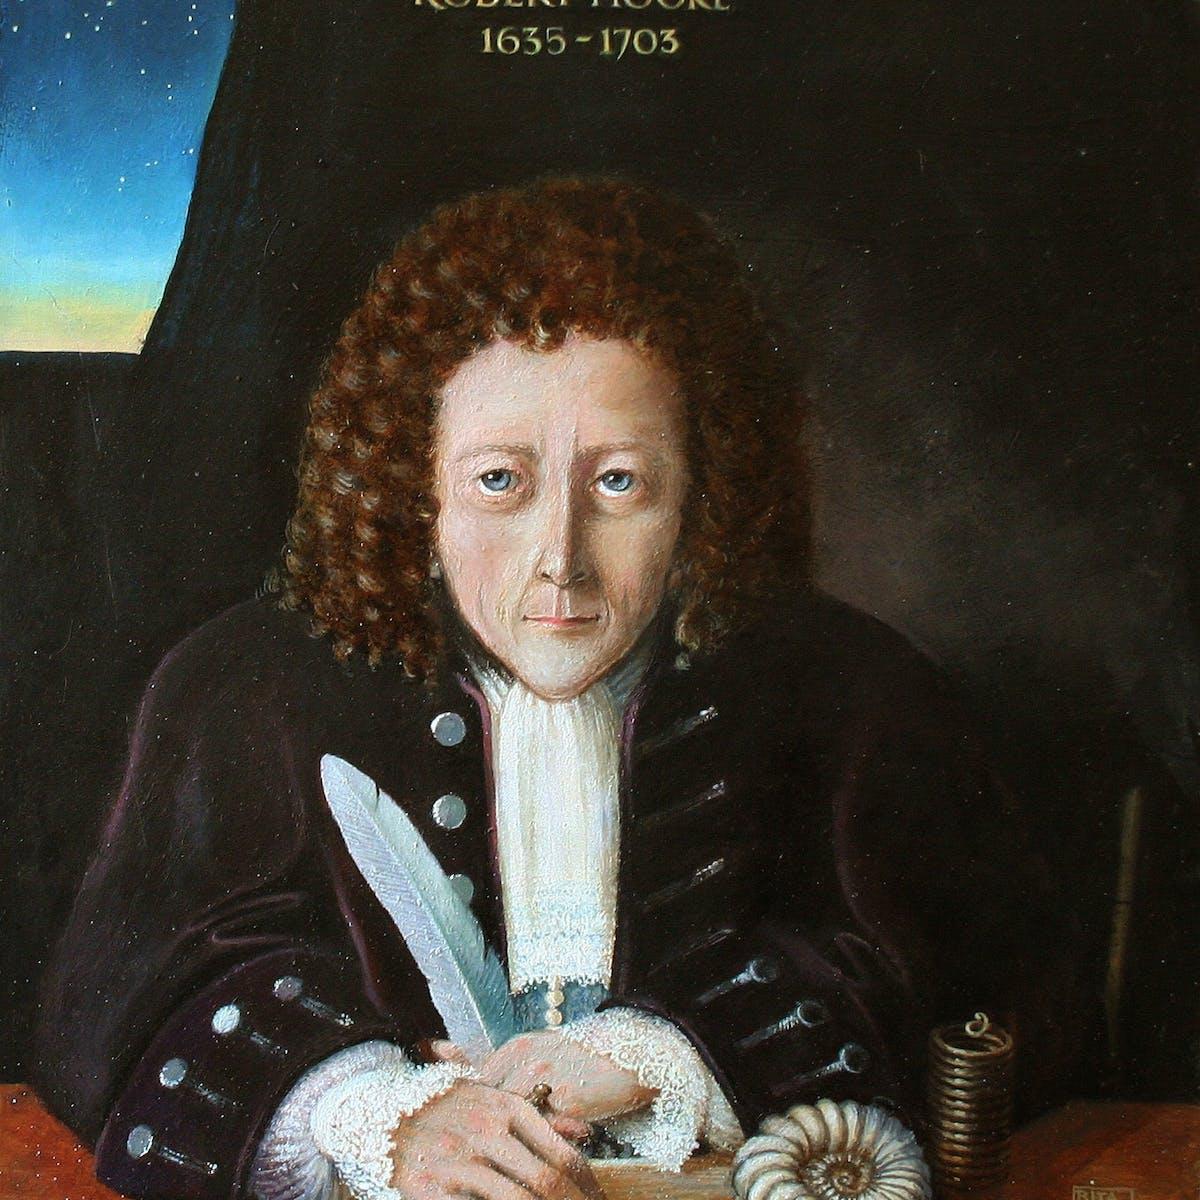 Robert Hooke: The 'English Leonardo' who was a 17th-century scientific  superstar